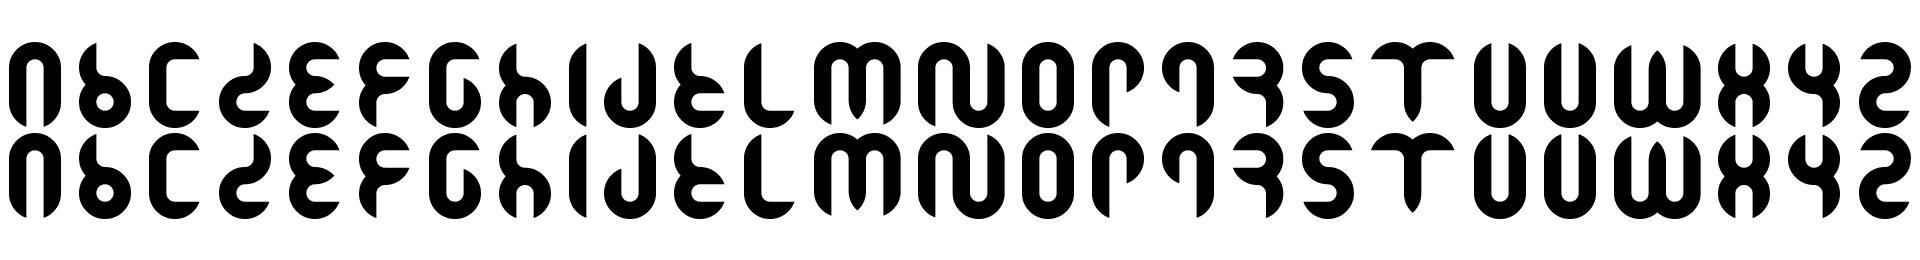 Ramasuri